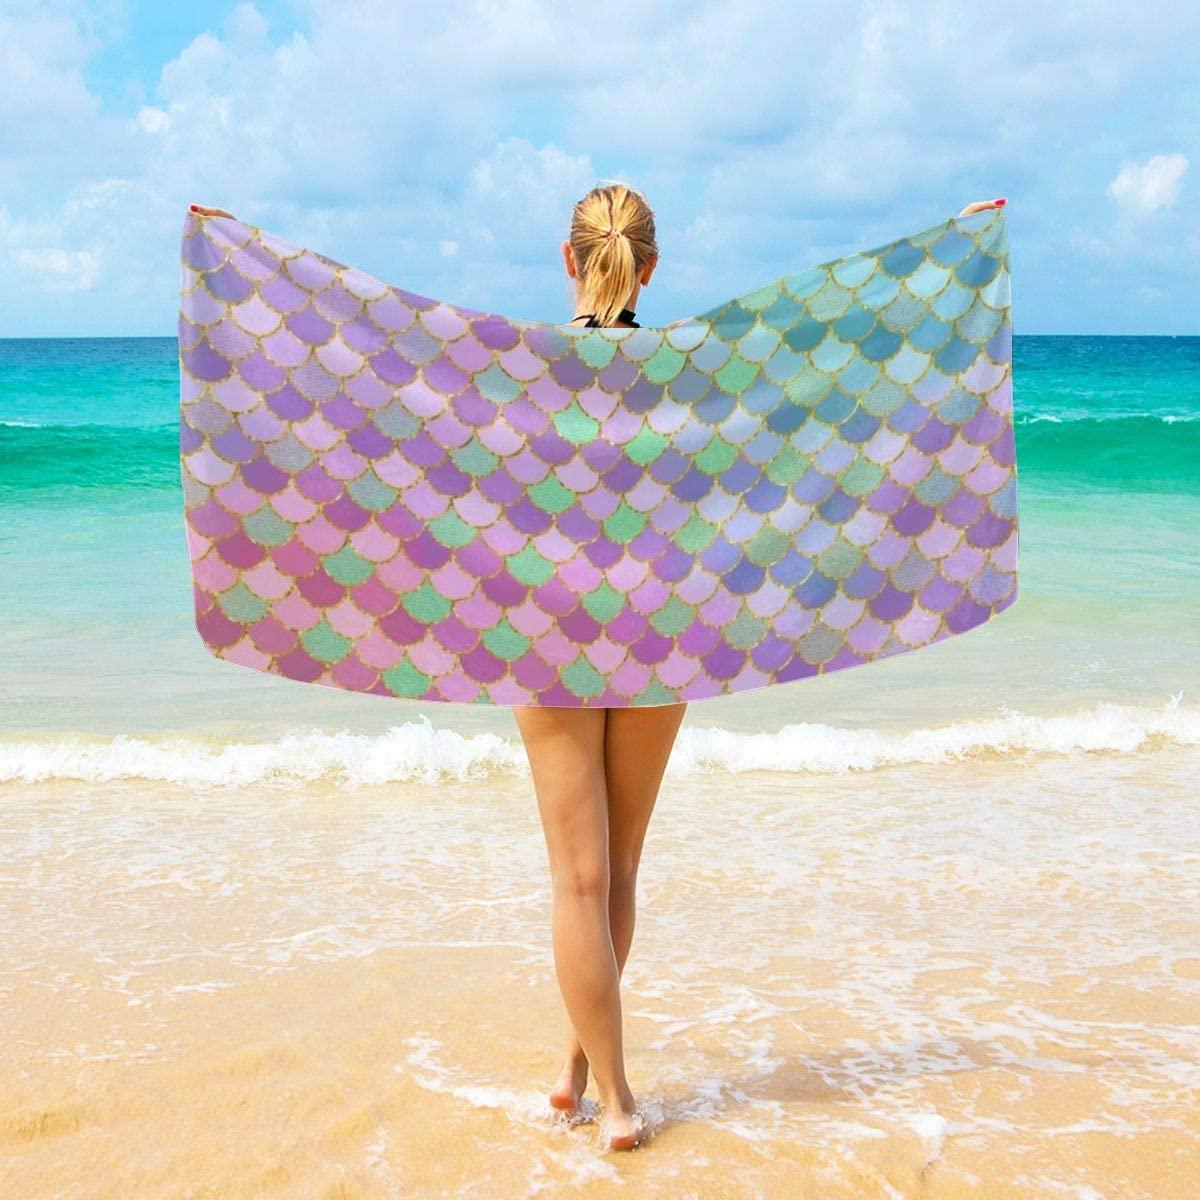 Beautiful Mermaid Fish Scales Art Microfiber Beach Travel Bath Towel Sand Free Proof Swim Towel Quick Fast Drying Beach Blanket Absorbent Shower Body Towels Yoga Mat for Adults 32x52 40x70